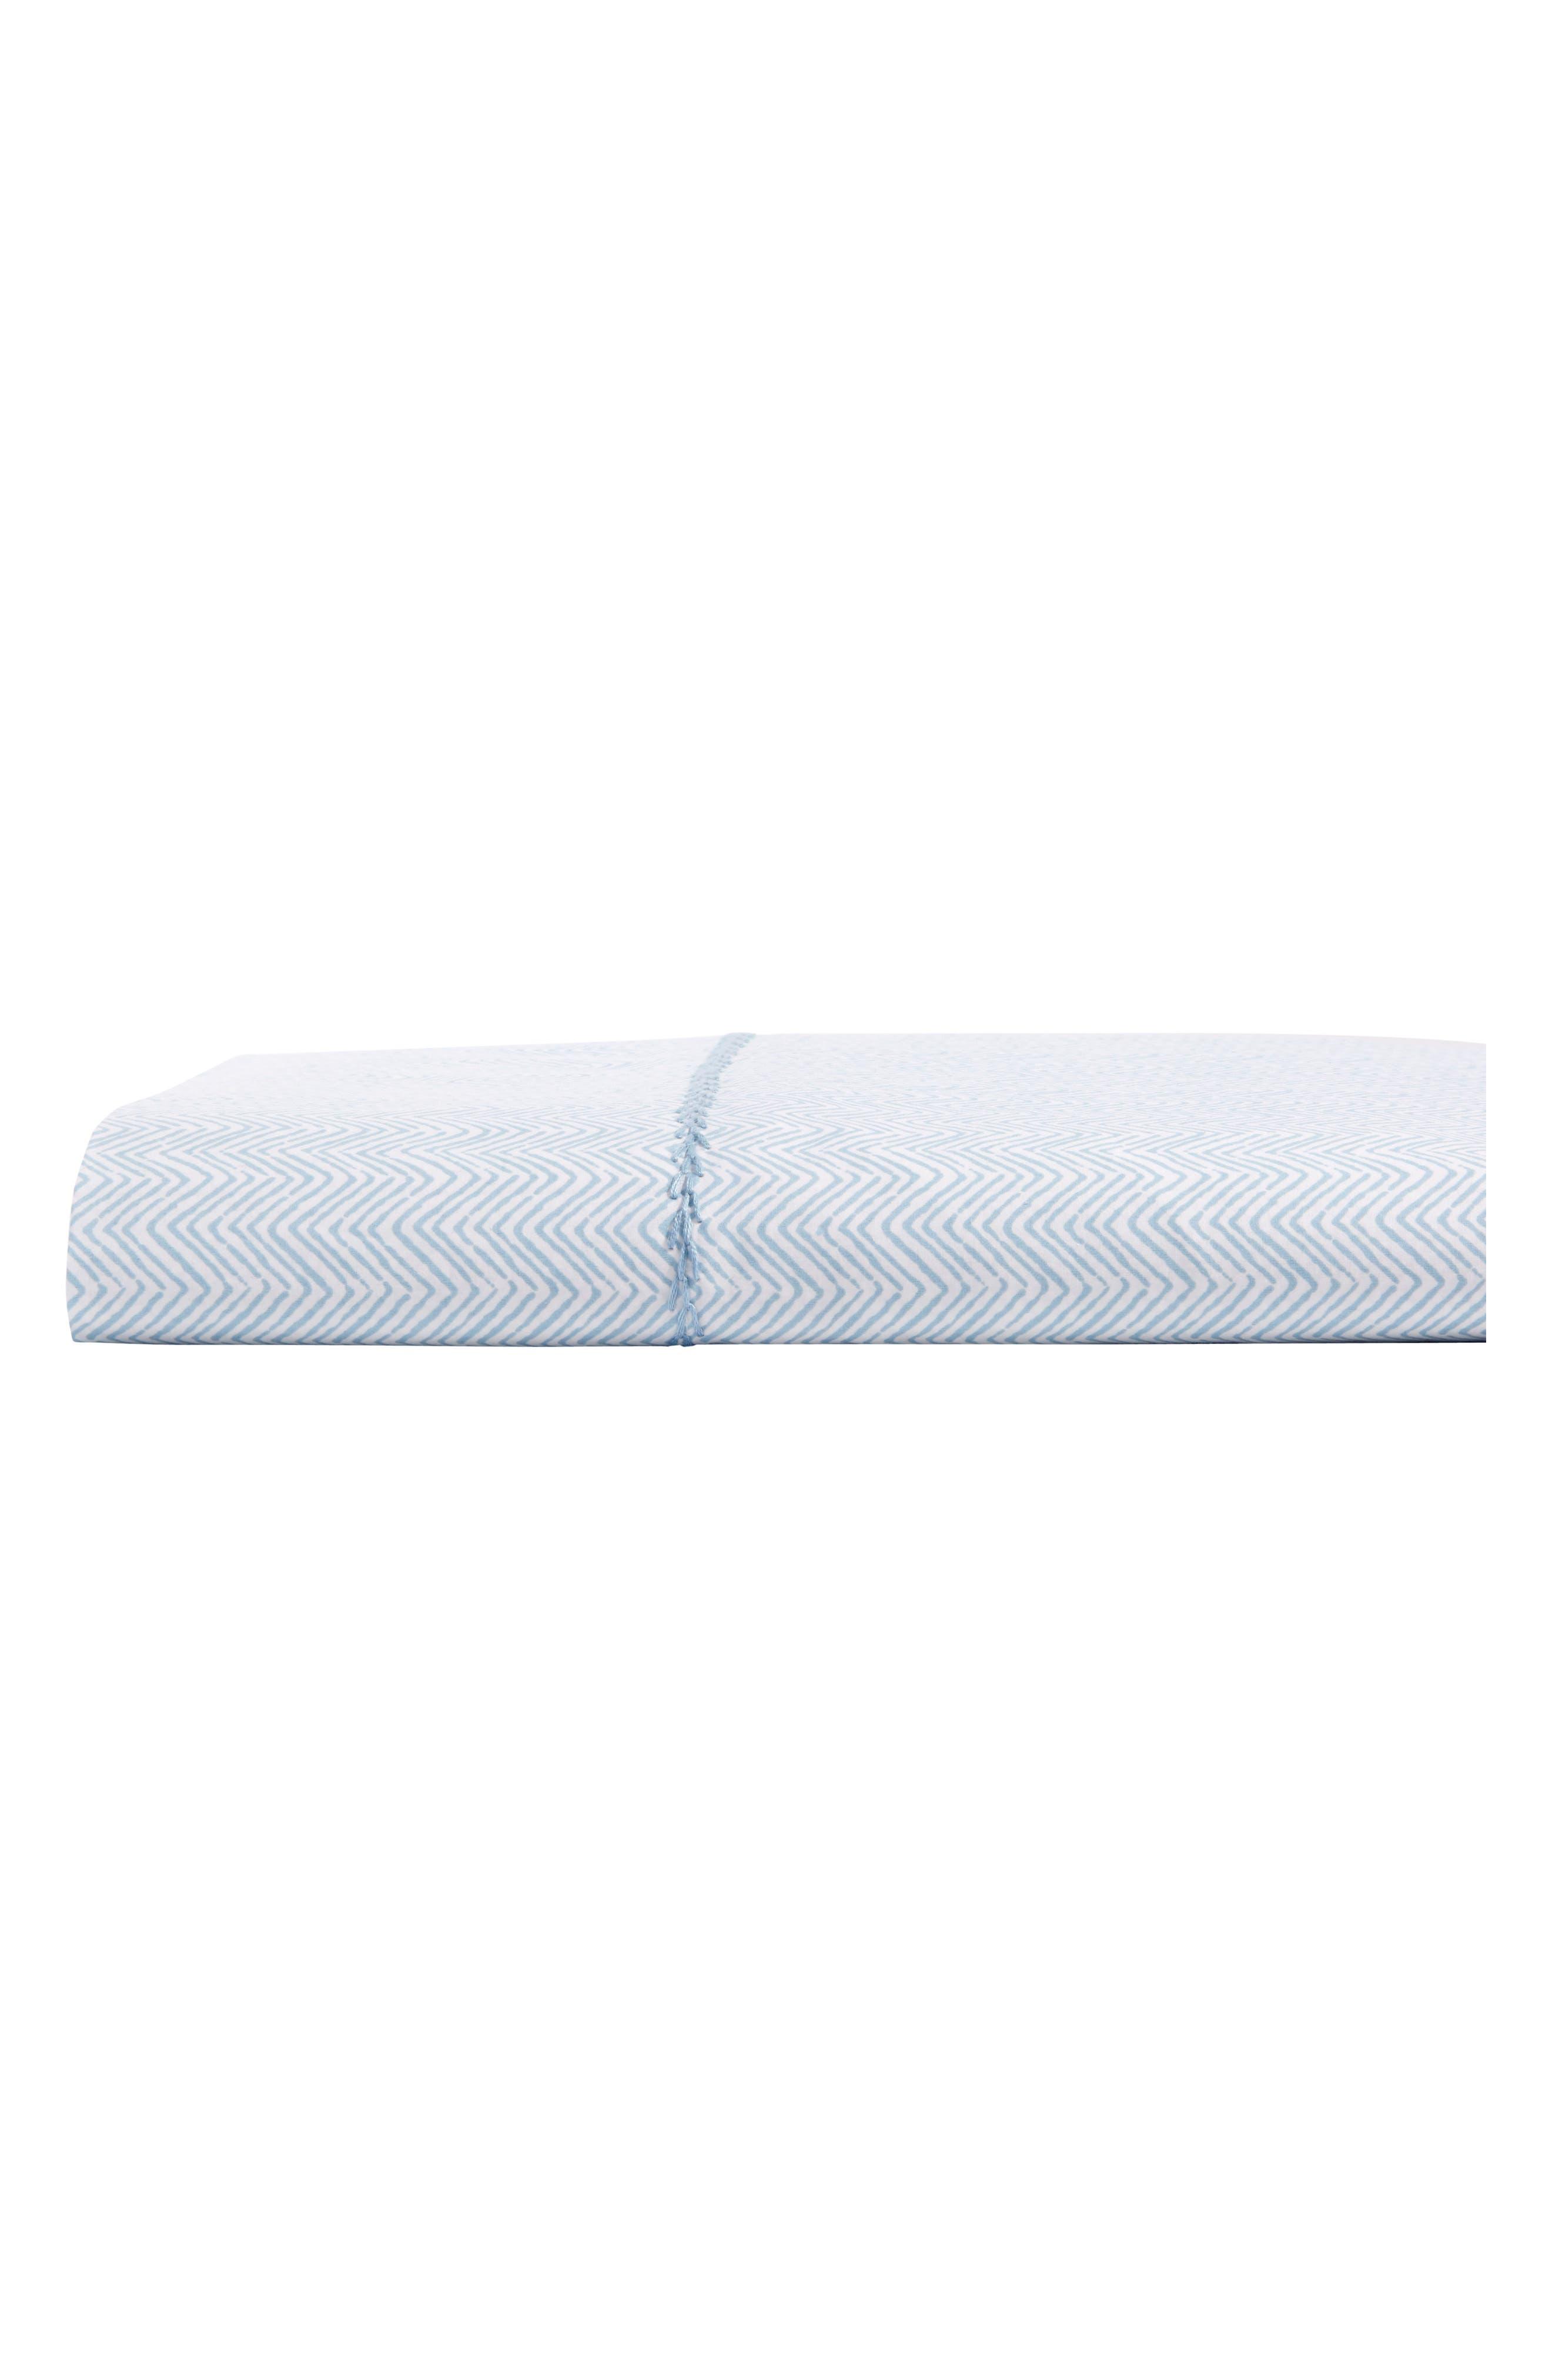 Chevron 400 Thread Count Flat Sheet,                         Main,                         color, Light Indigo White